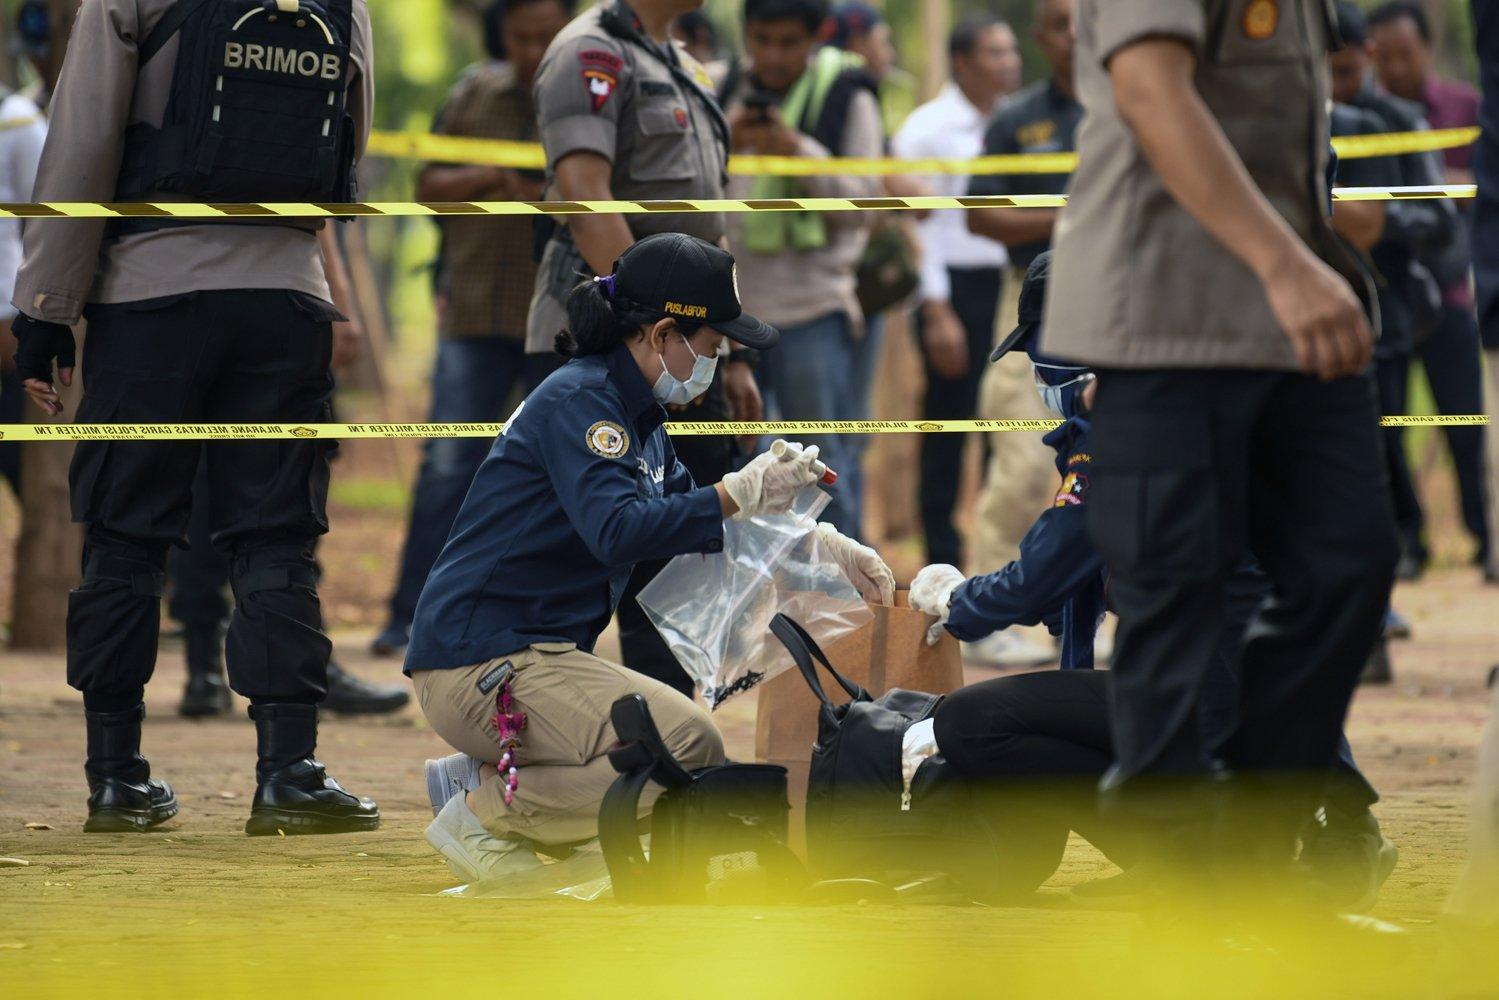 Anggota Labfor Mabes Polri mengumpulkan barang bukti di TKP ledakan di kawasan Monas, Jakarta, Selasa (3/12/2019).